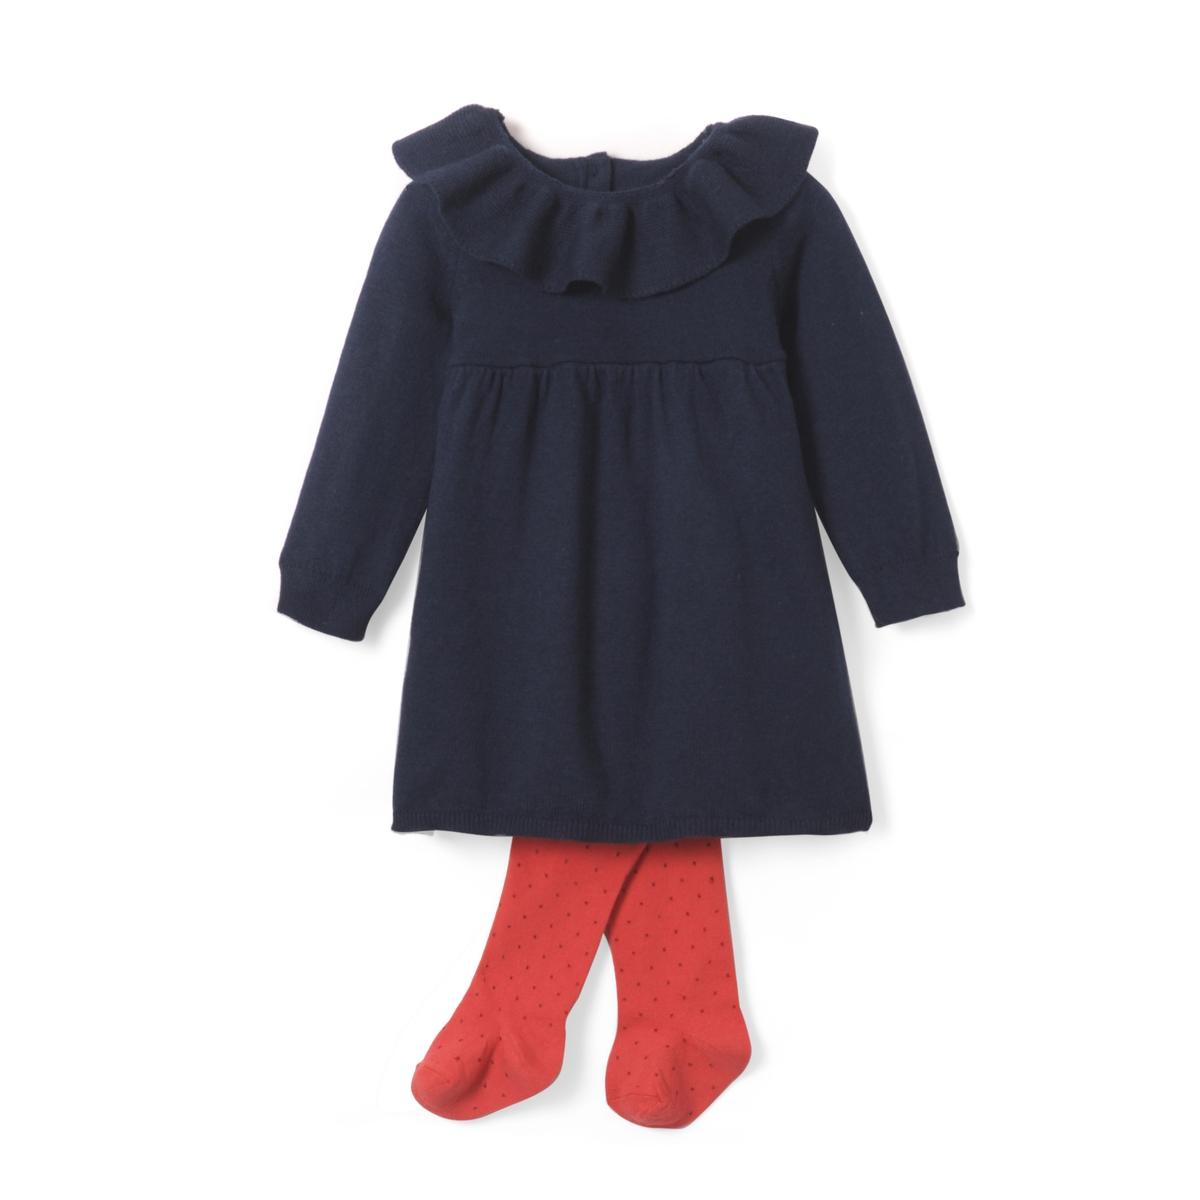 Комлект платье + колготки 1 мес - 3 лет